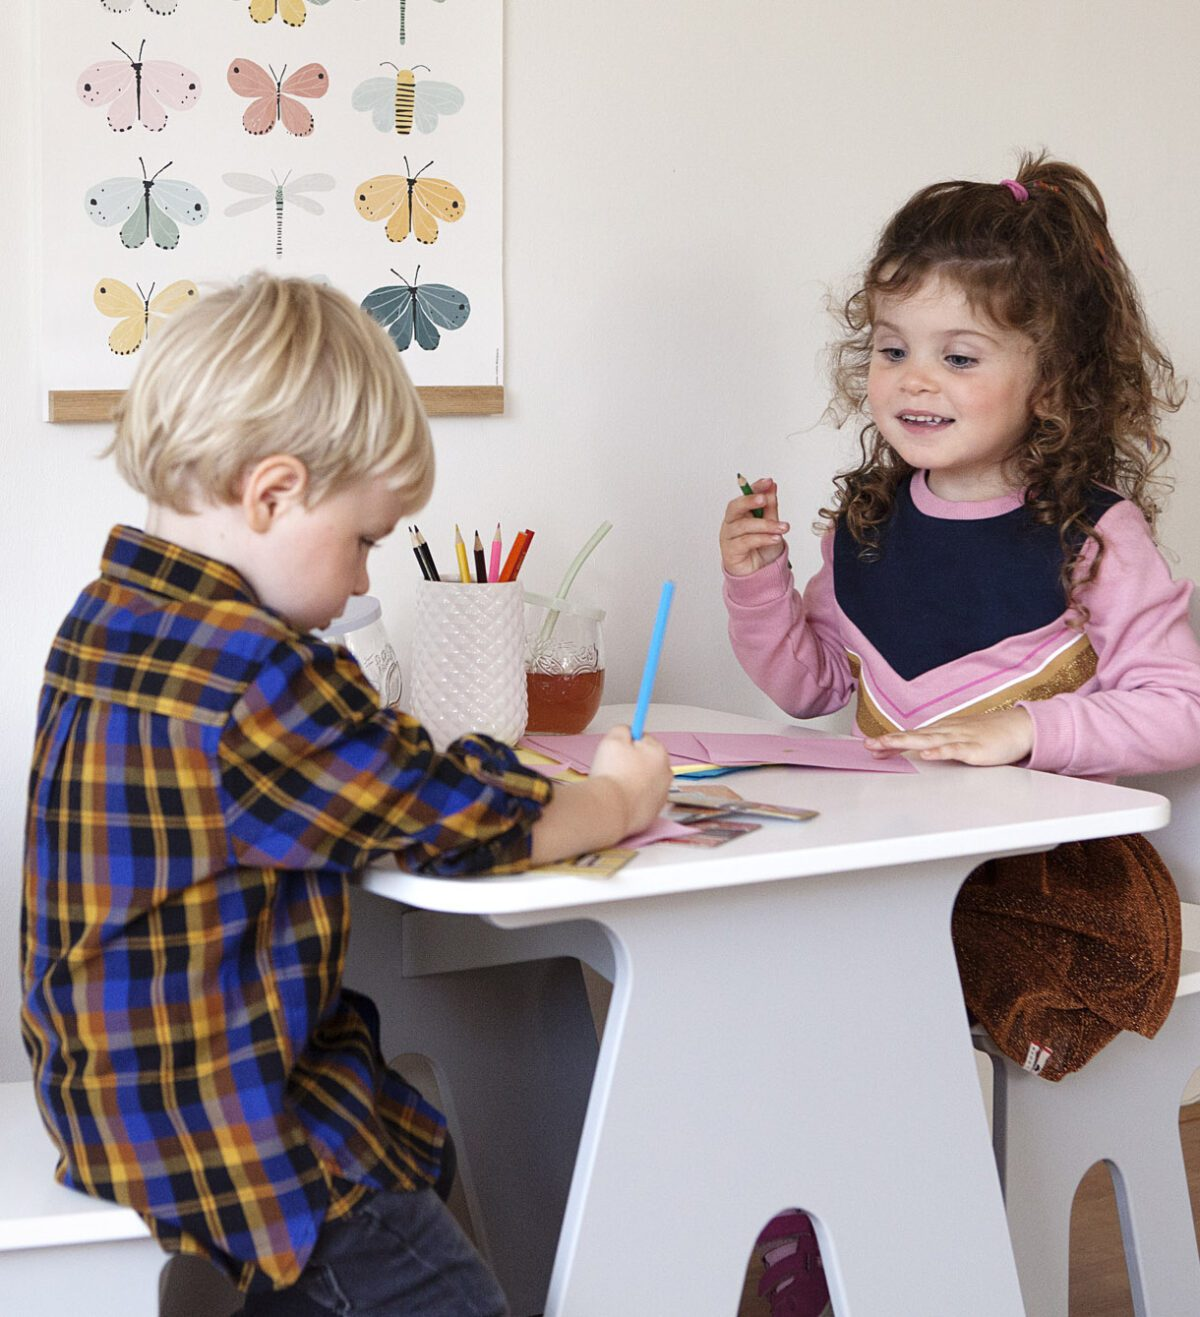 Dipperdee kindertafeltje en kinderstoeltje sfeer